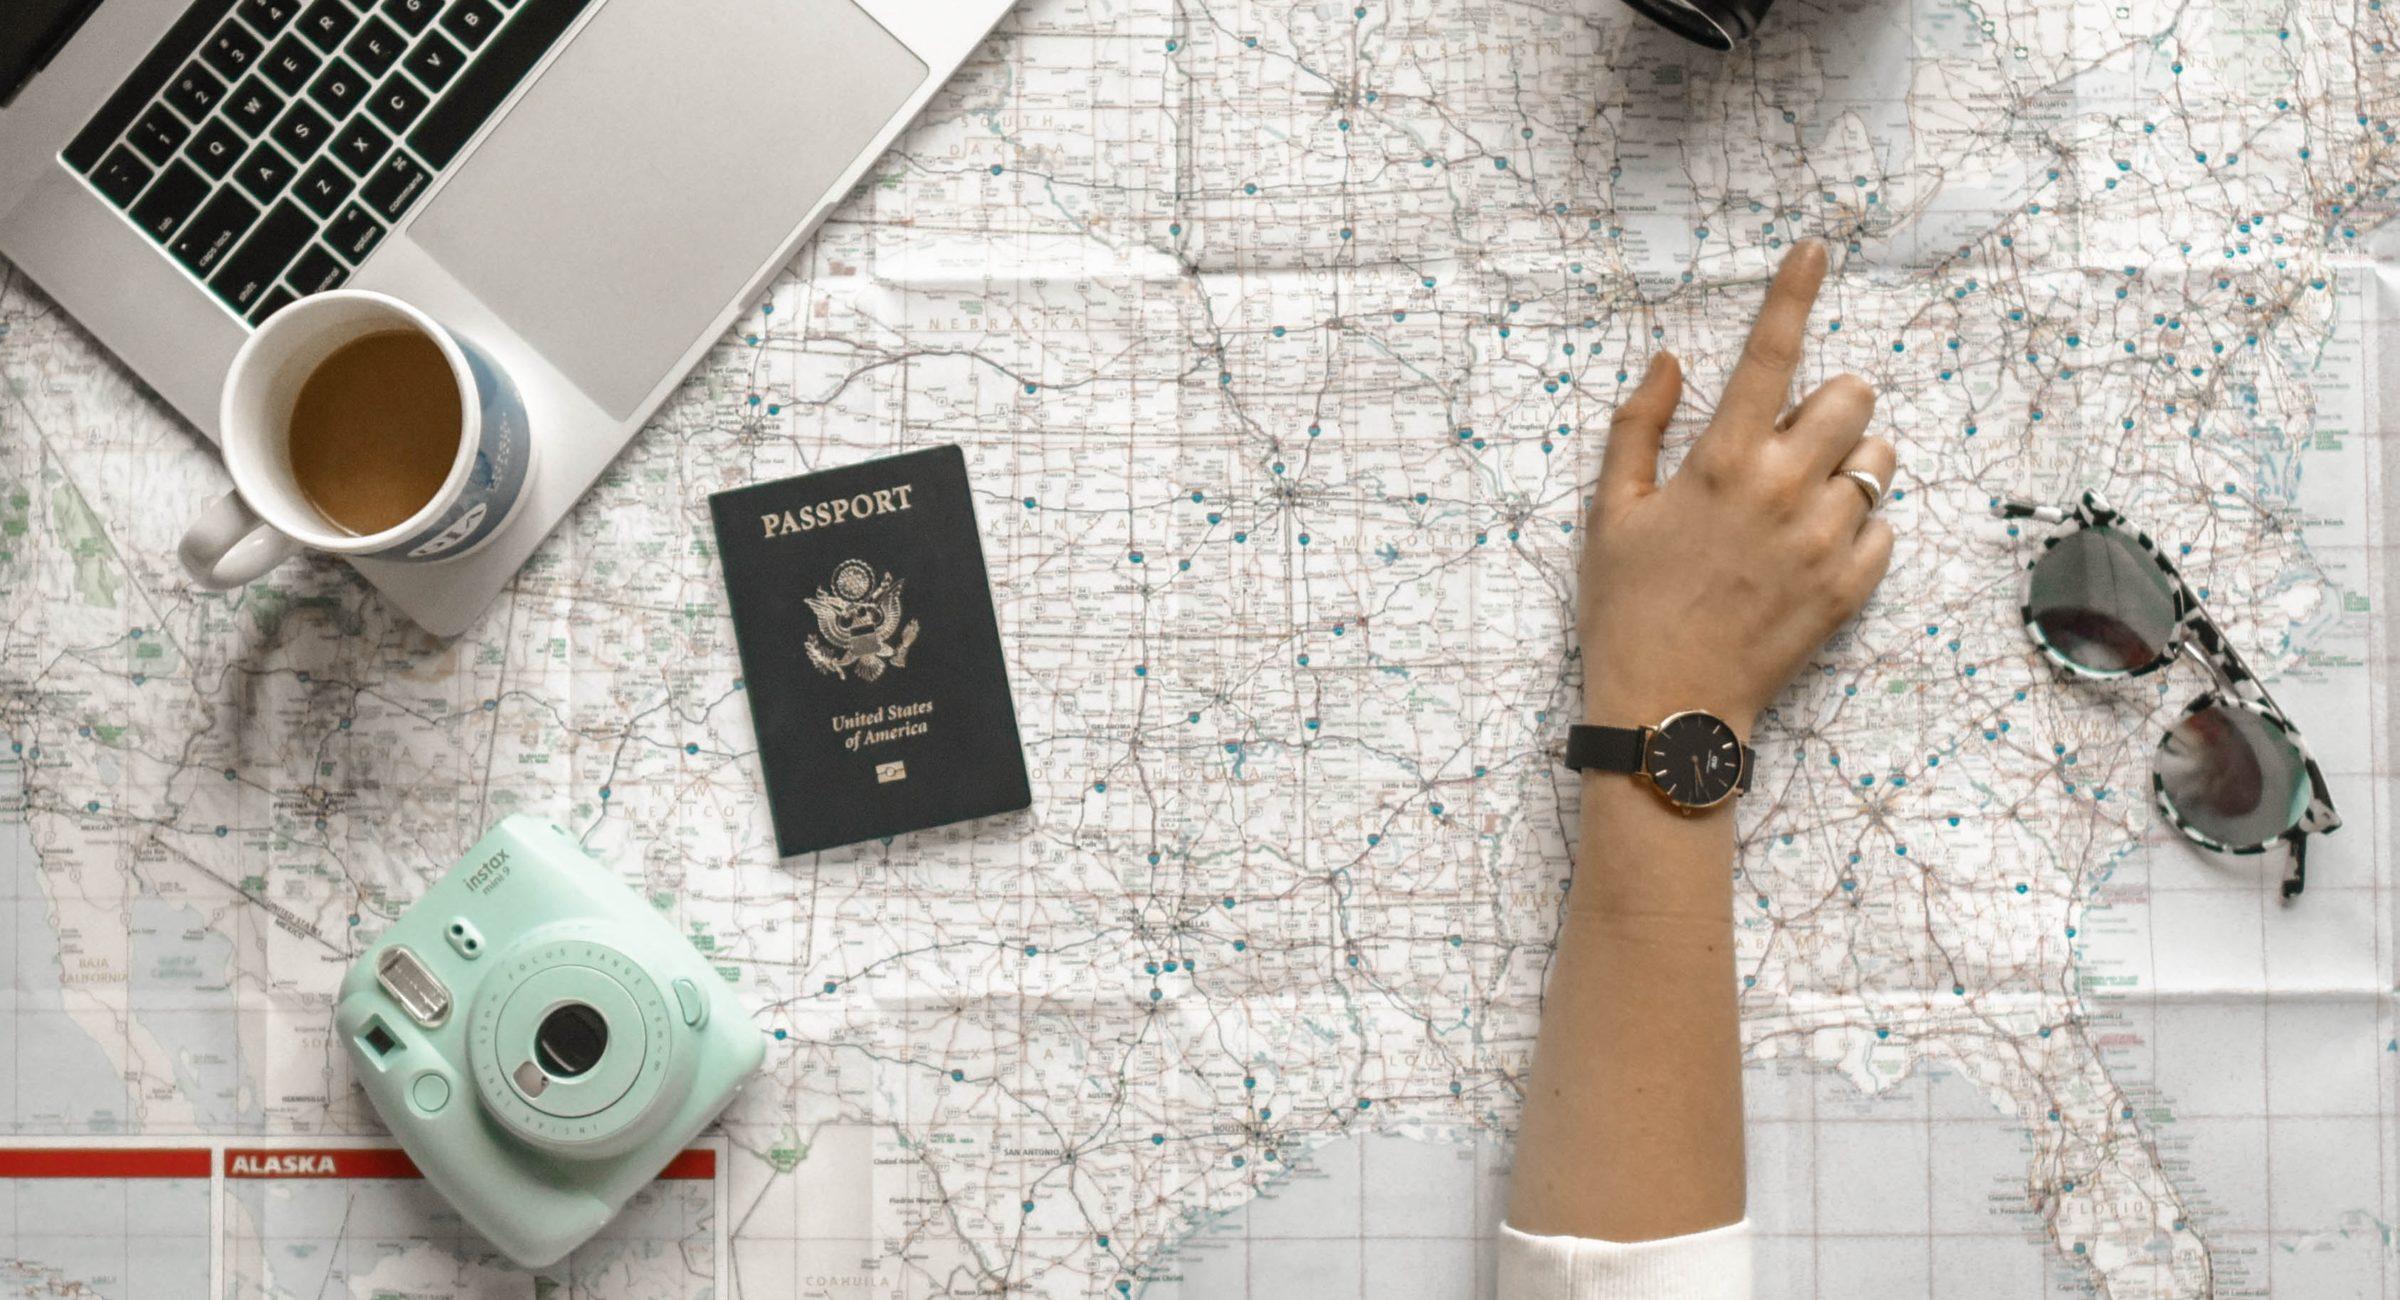 How to plan a trip? Choose a destination